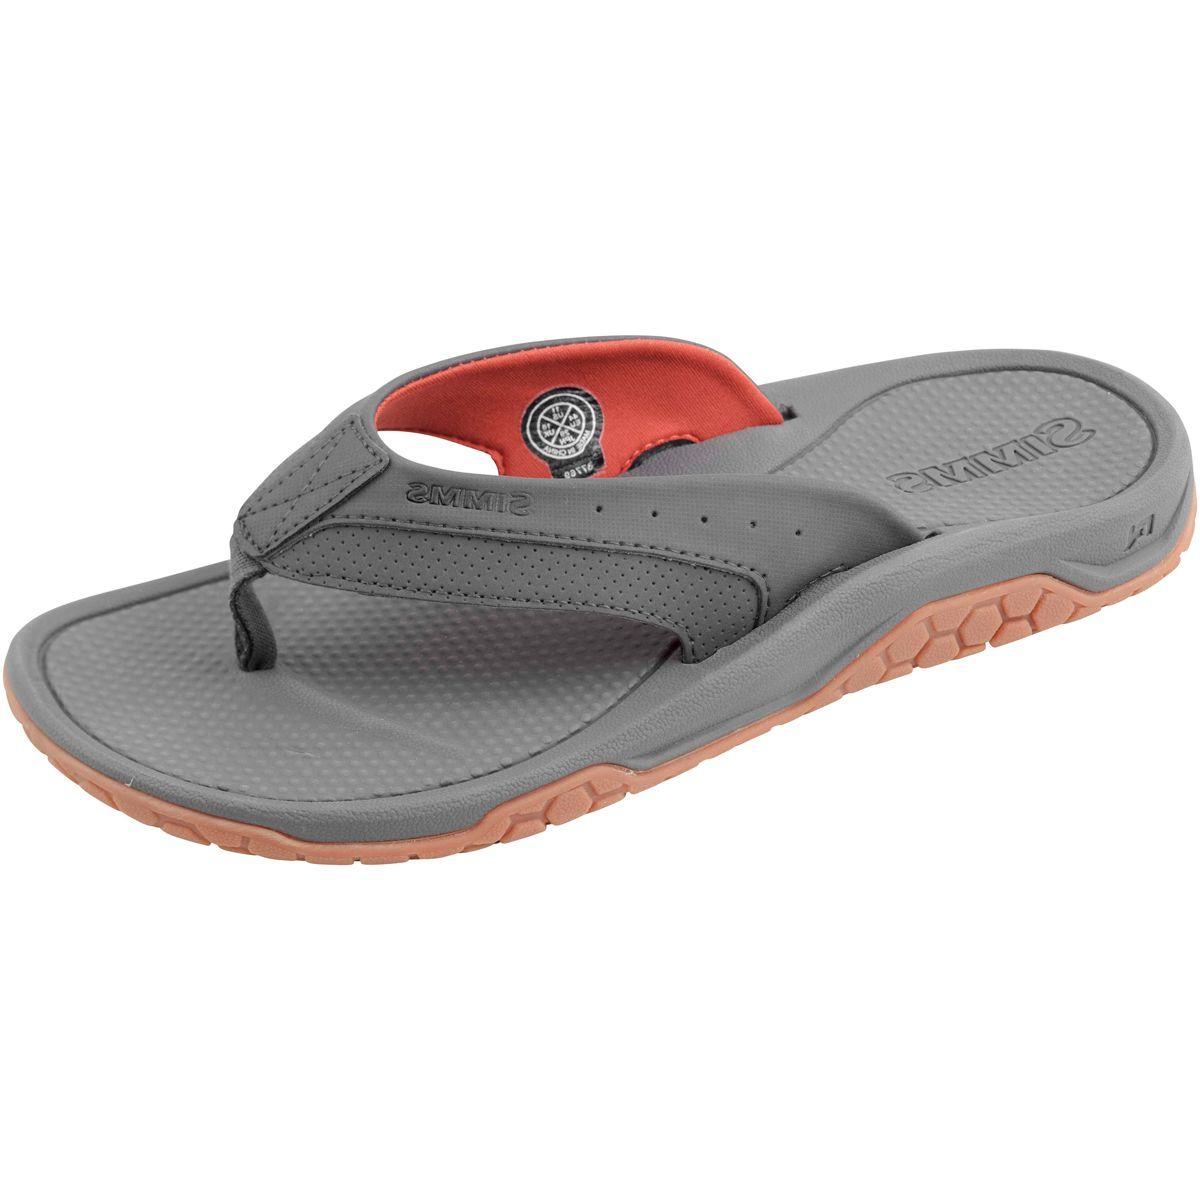 Simms Cuddy Flip Sandal - Men's